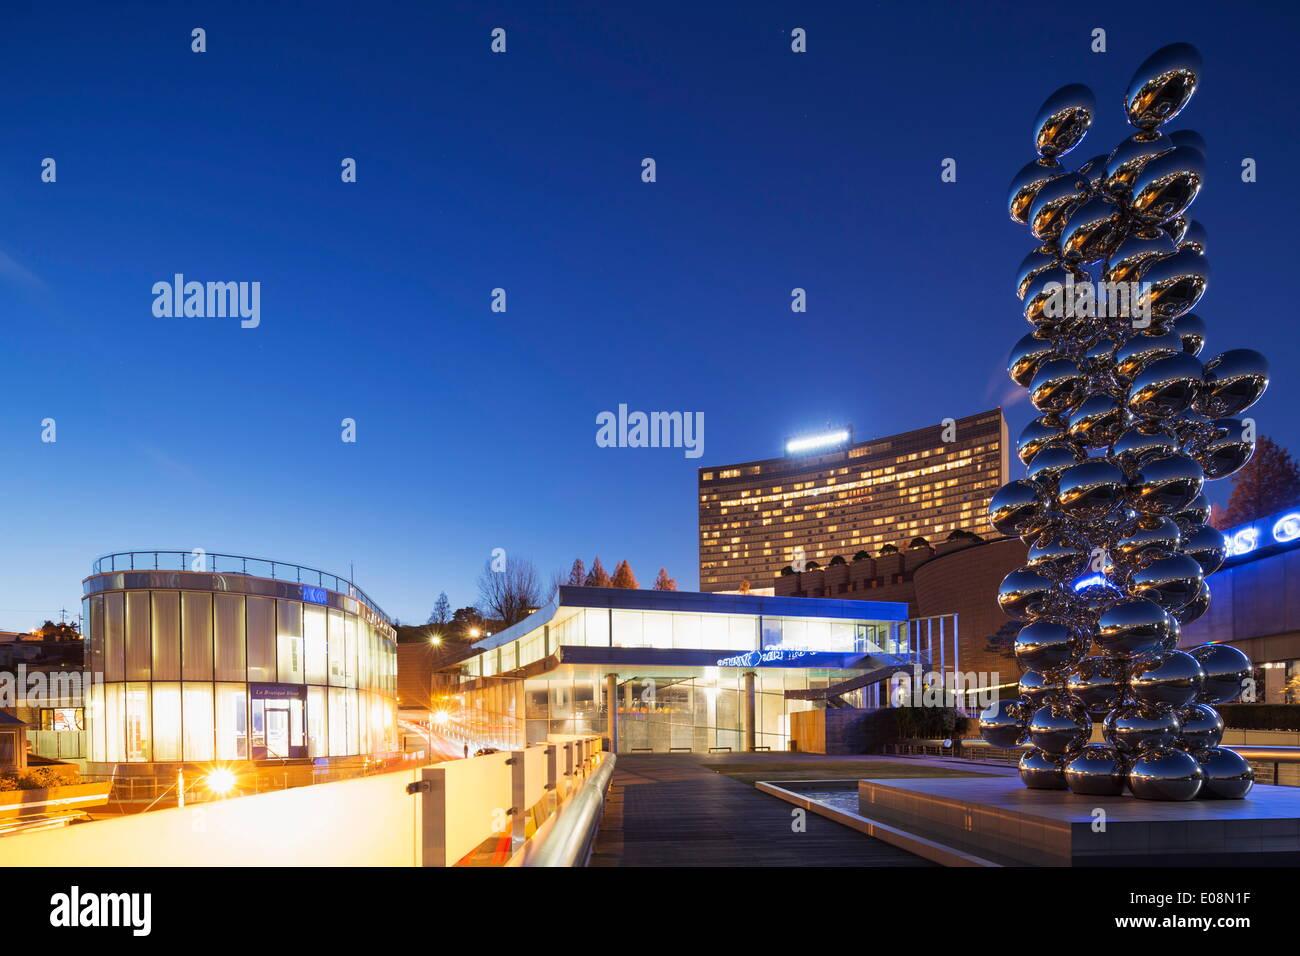 Leeum Samsung Museum of Art, Seoul, South Korea, Asia - Stock Image